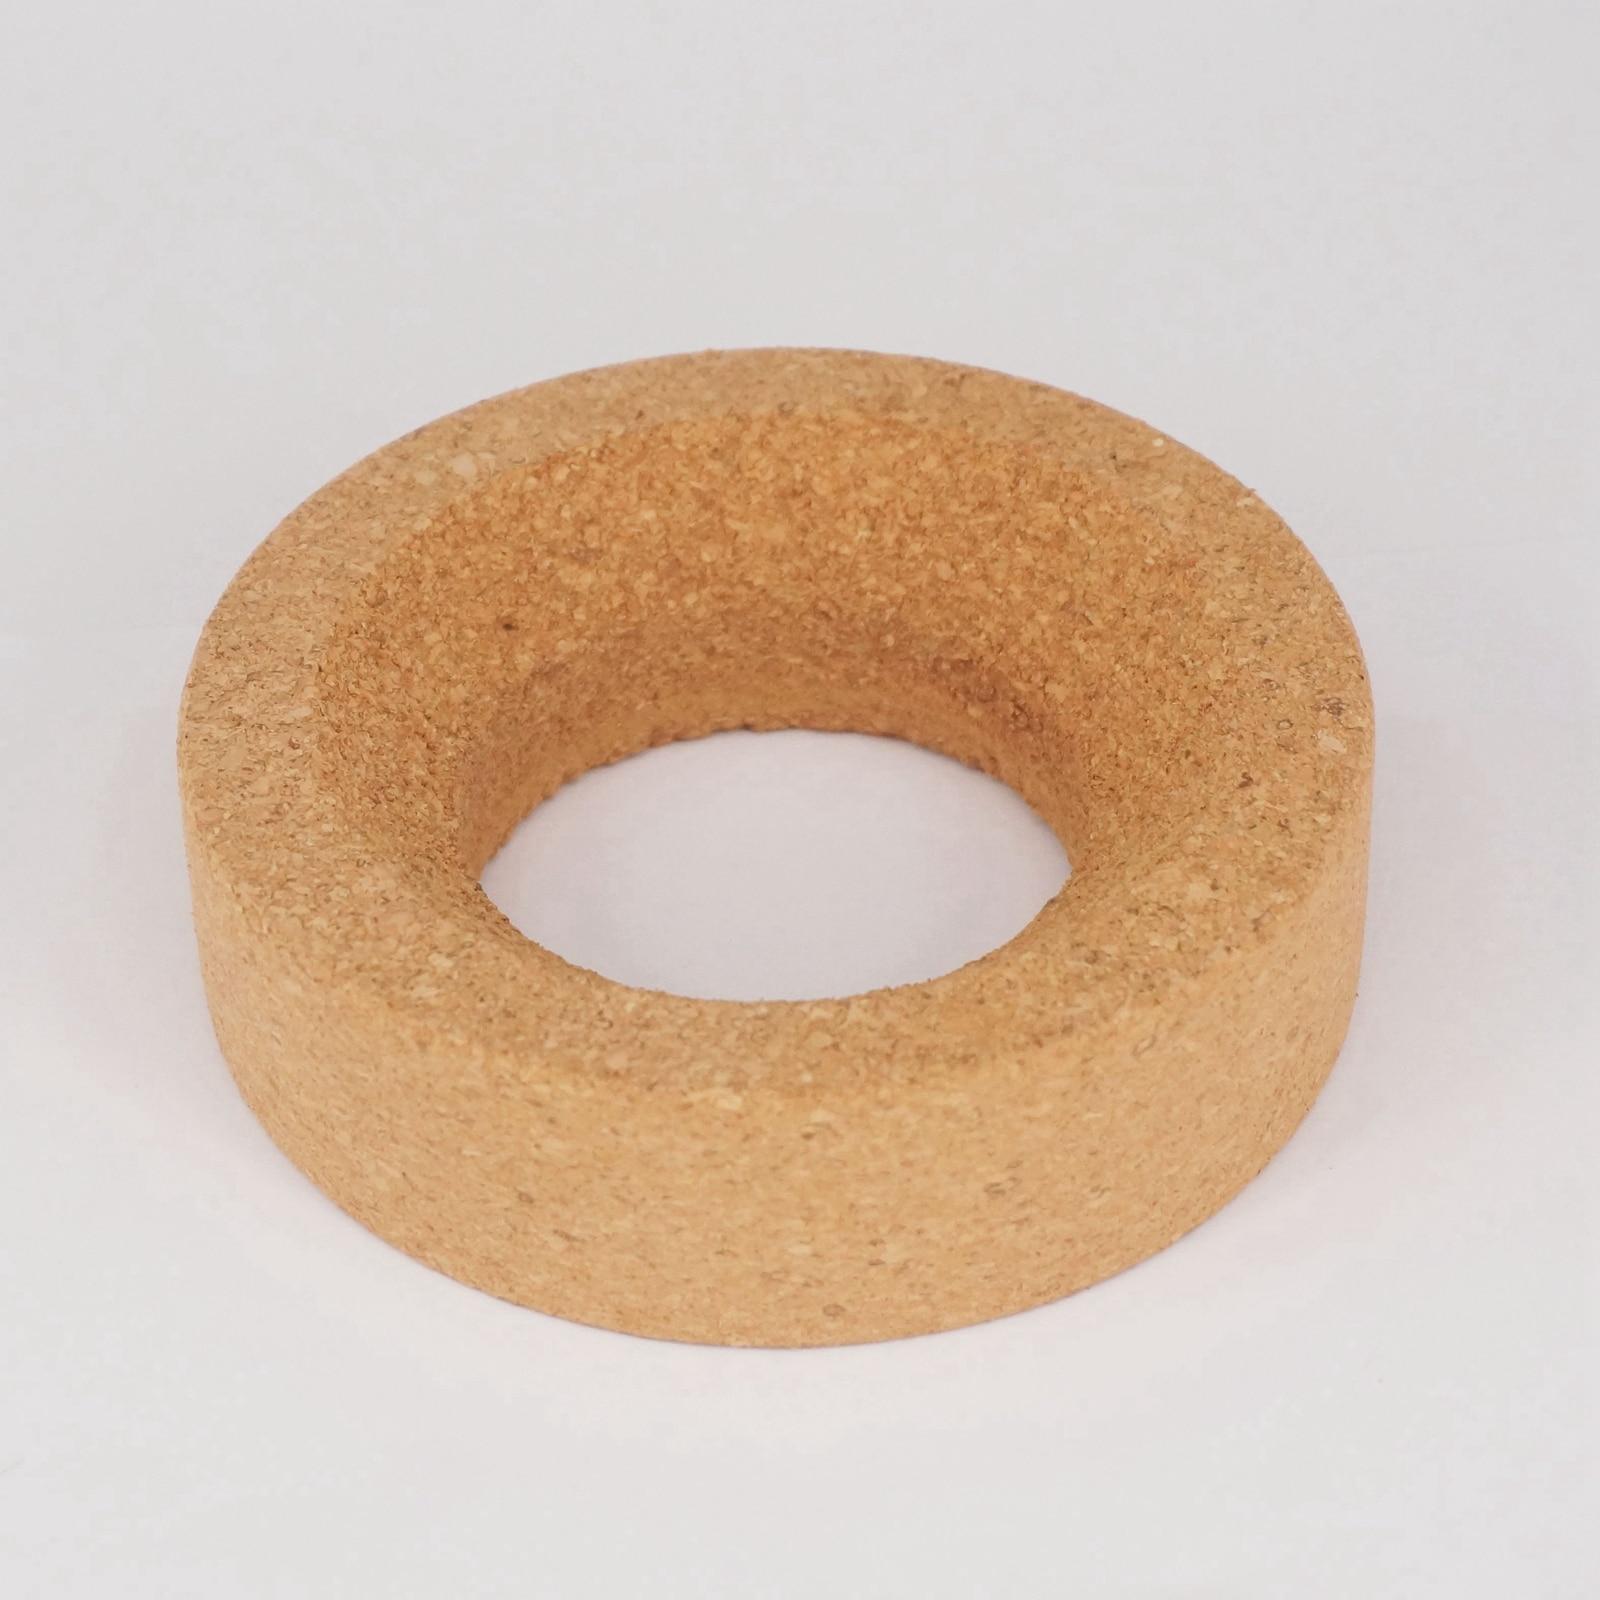 110mm Diameter Laboratory Synthetic Cork Ring Holder For Round Bottom Flask 250ml-2000ml